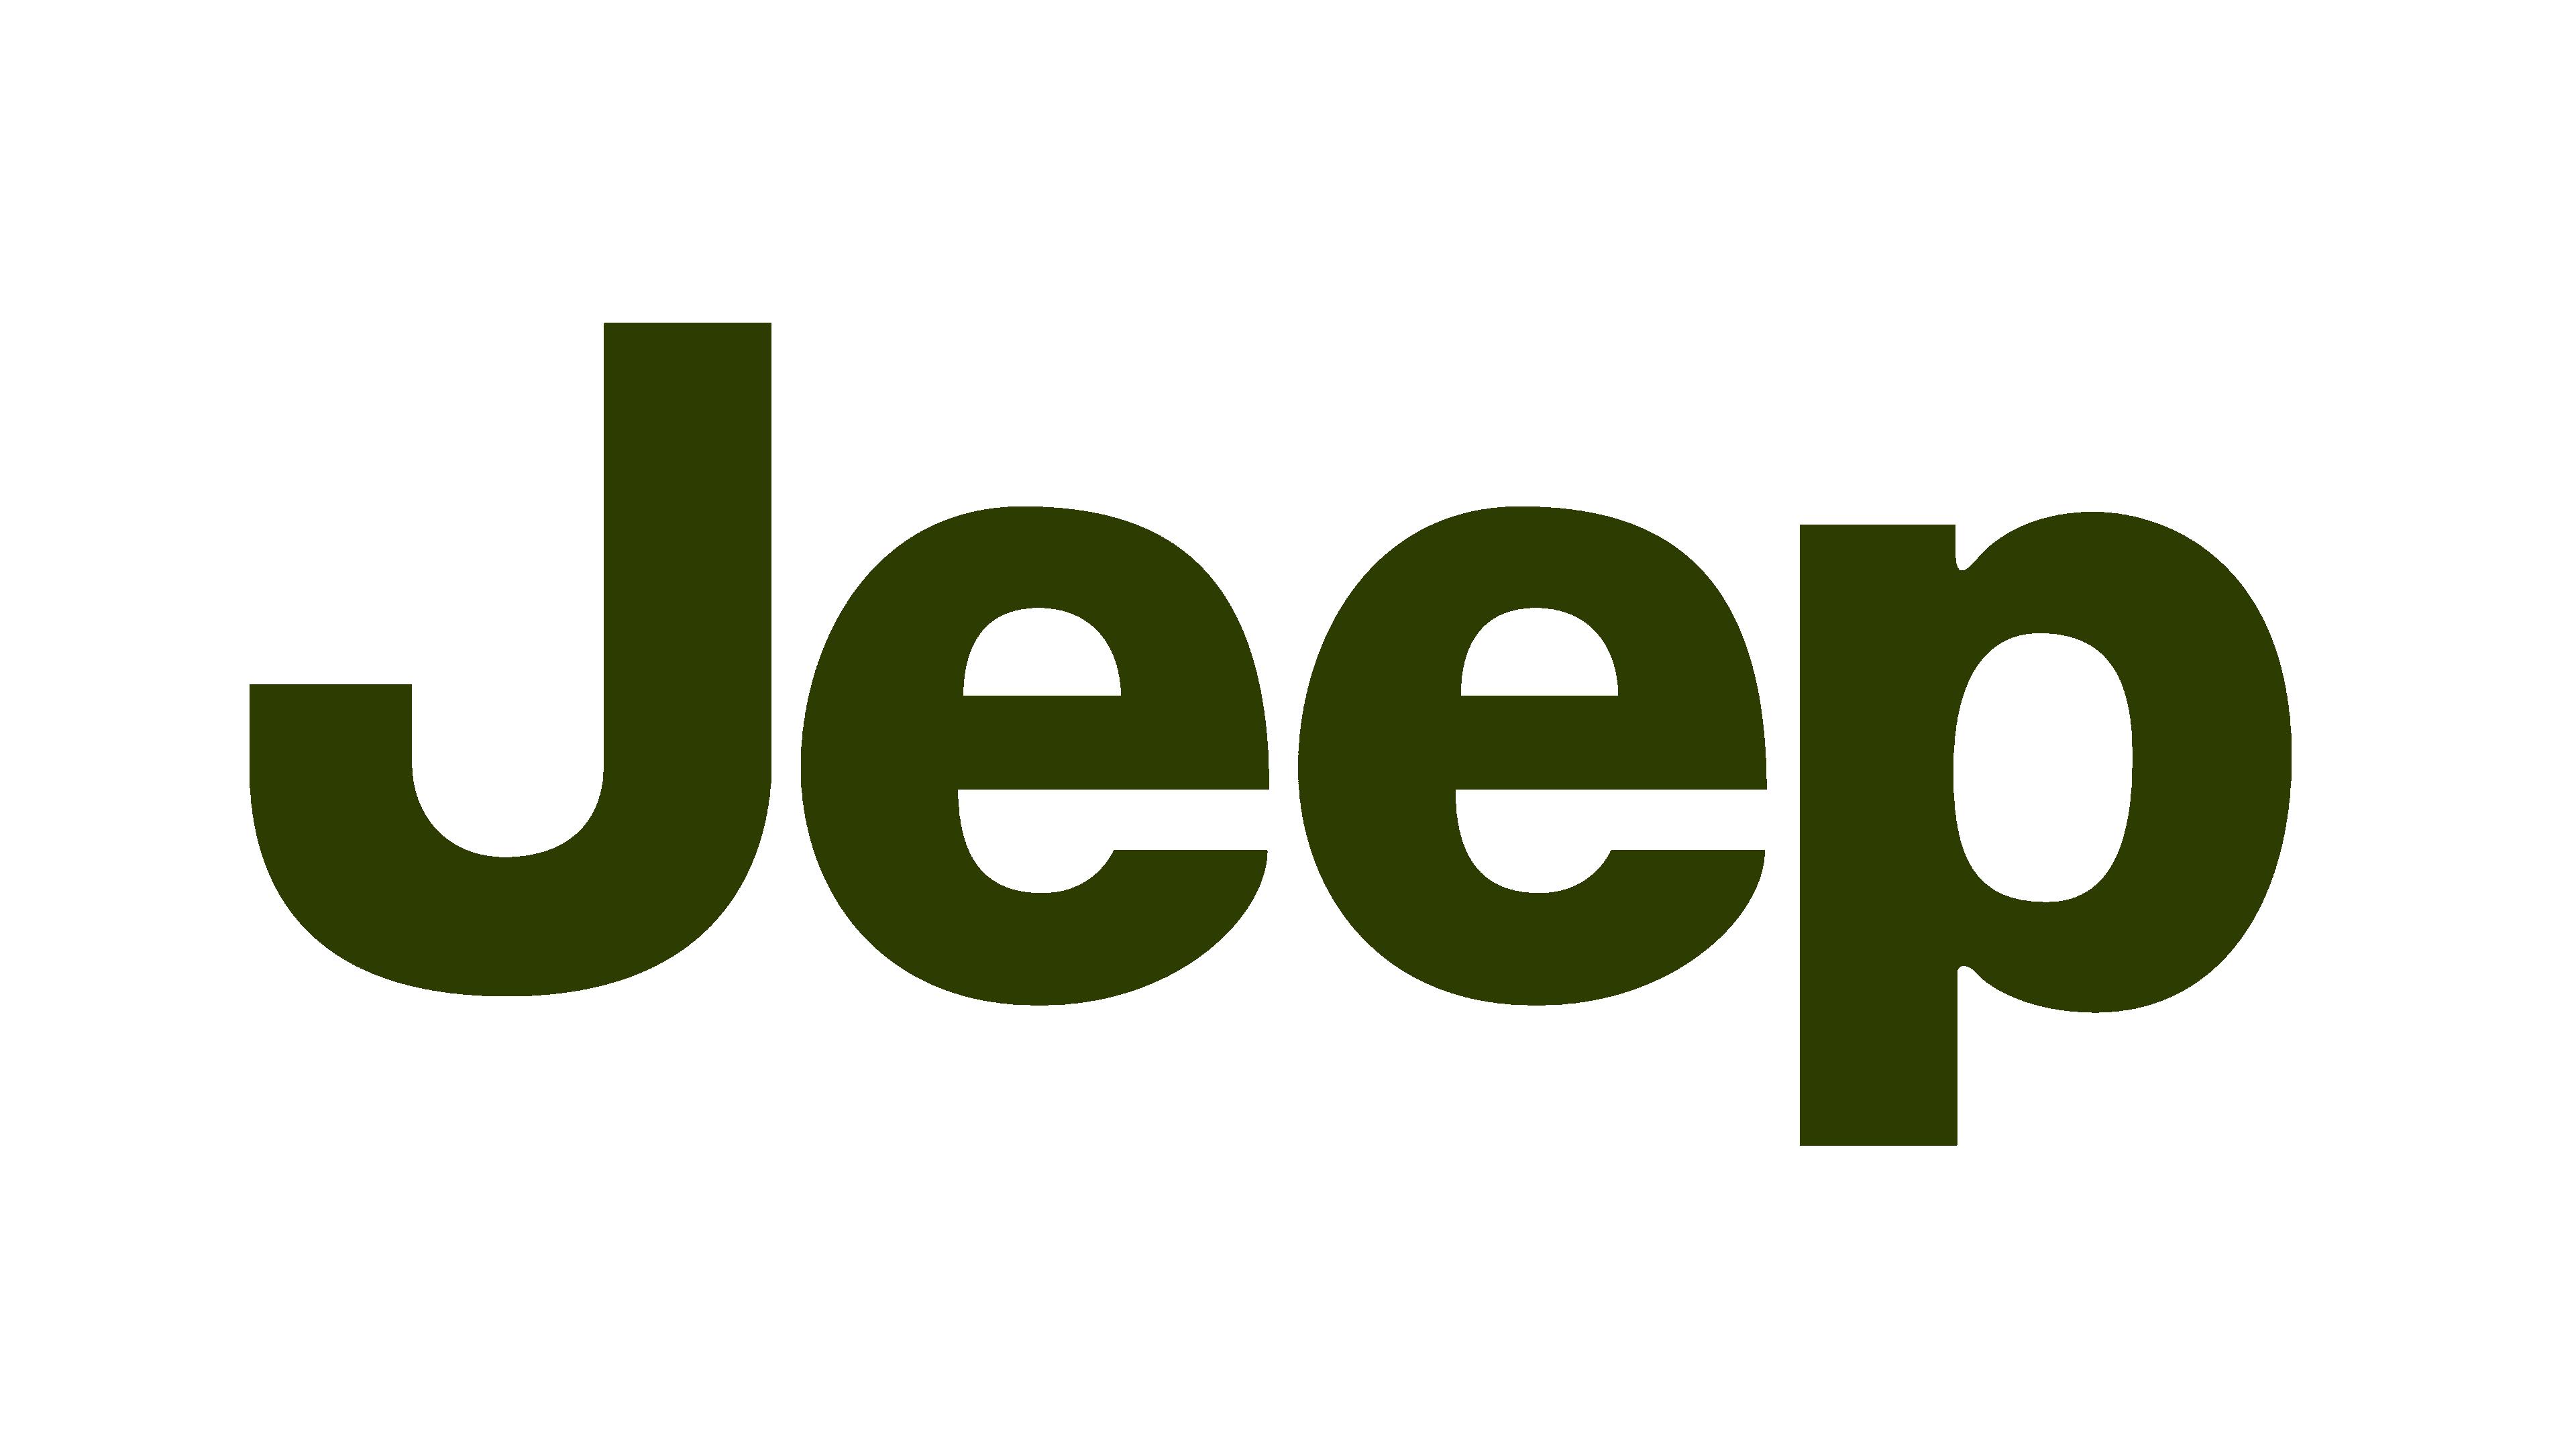 Jeep-logo-green-3840x2160